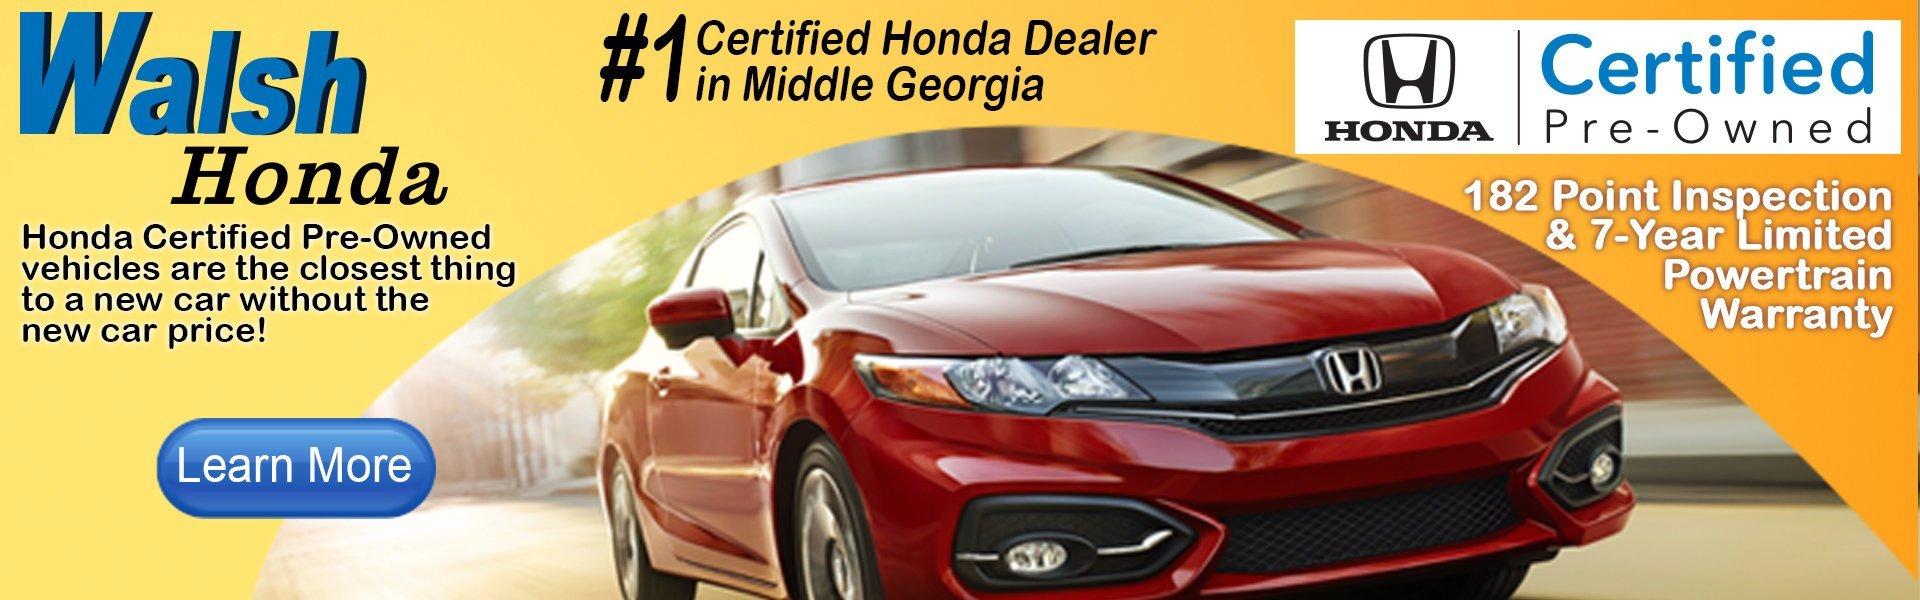 Walsh honda new used car suv truck sales macon for Honda dealers in georgia